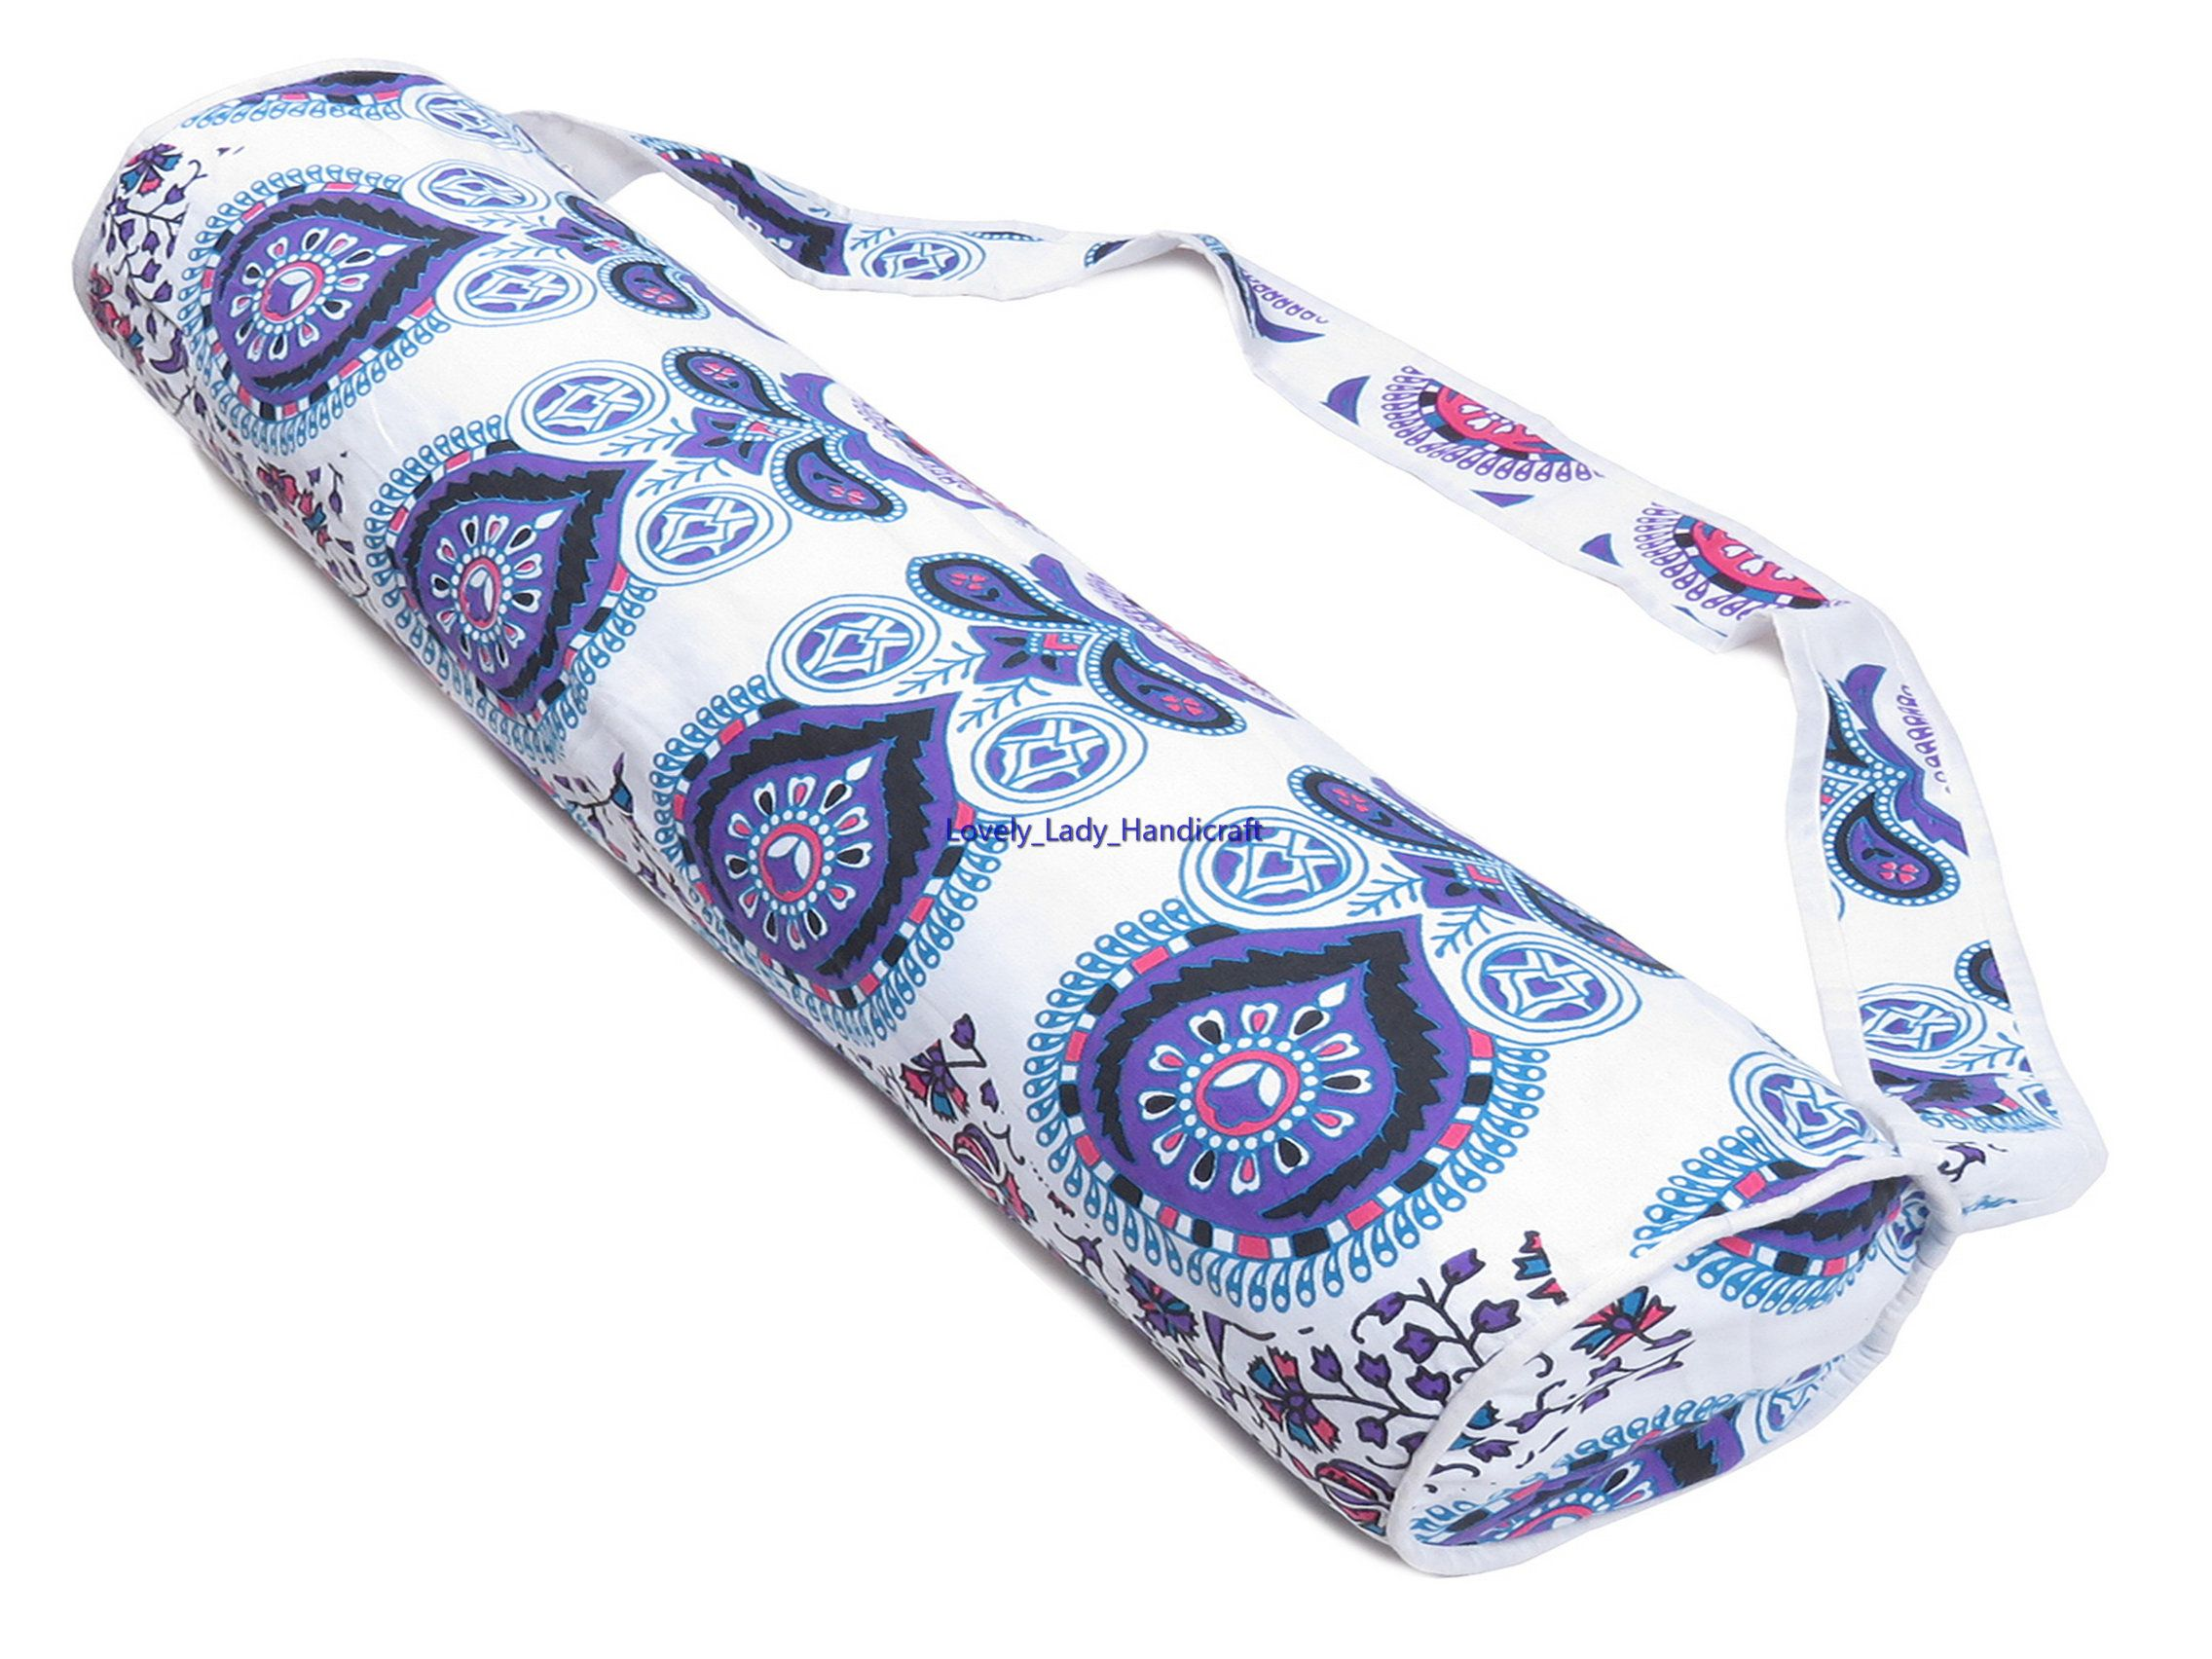 Indian Cotton Yoga Mat Bag Blue Carry Mandala Beach Bags Handmade Hippie Gym Mat Carrier Sports Bags With Shoulder Strap Llh1133 Yoga Mat Bag Blue Bags Yoga Bag